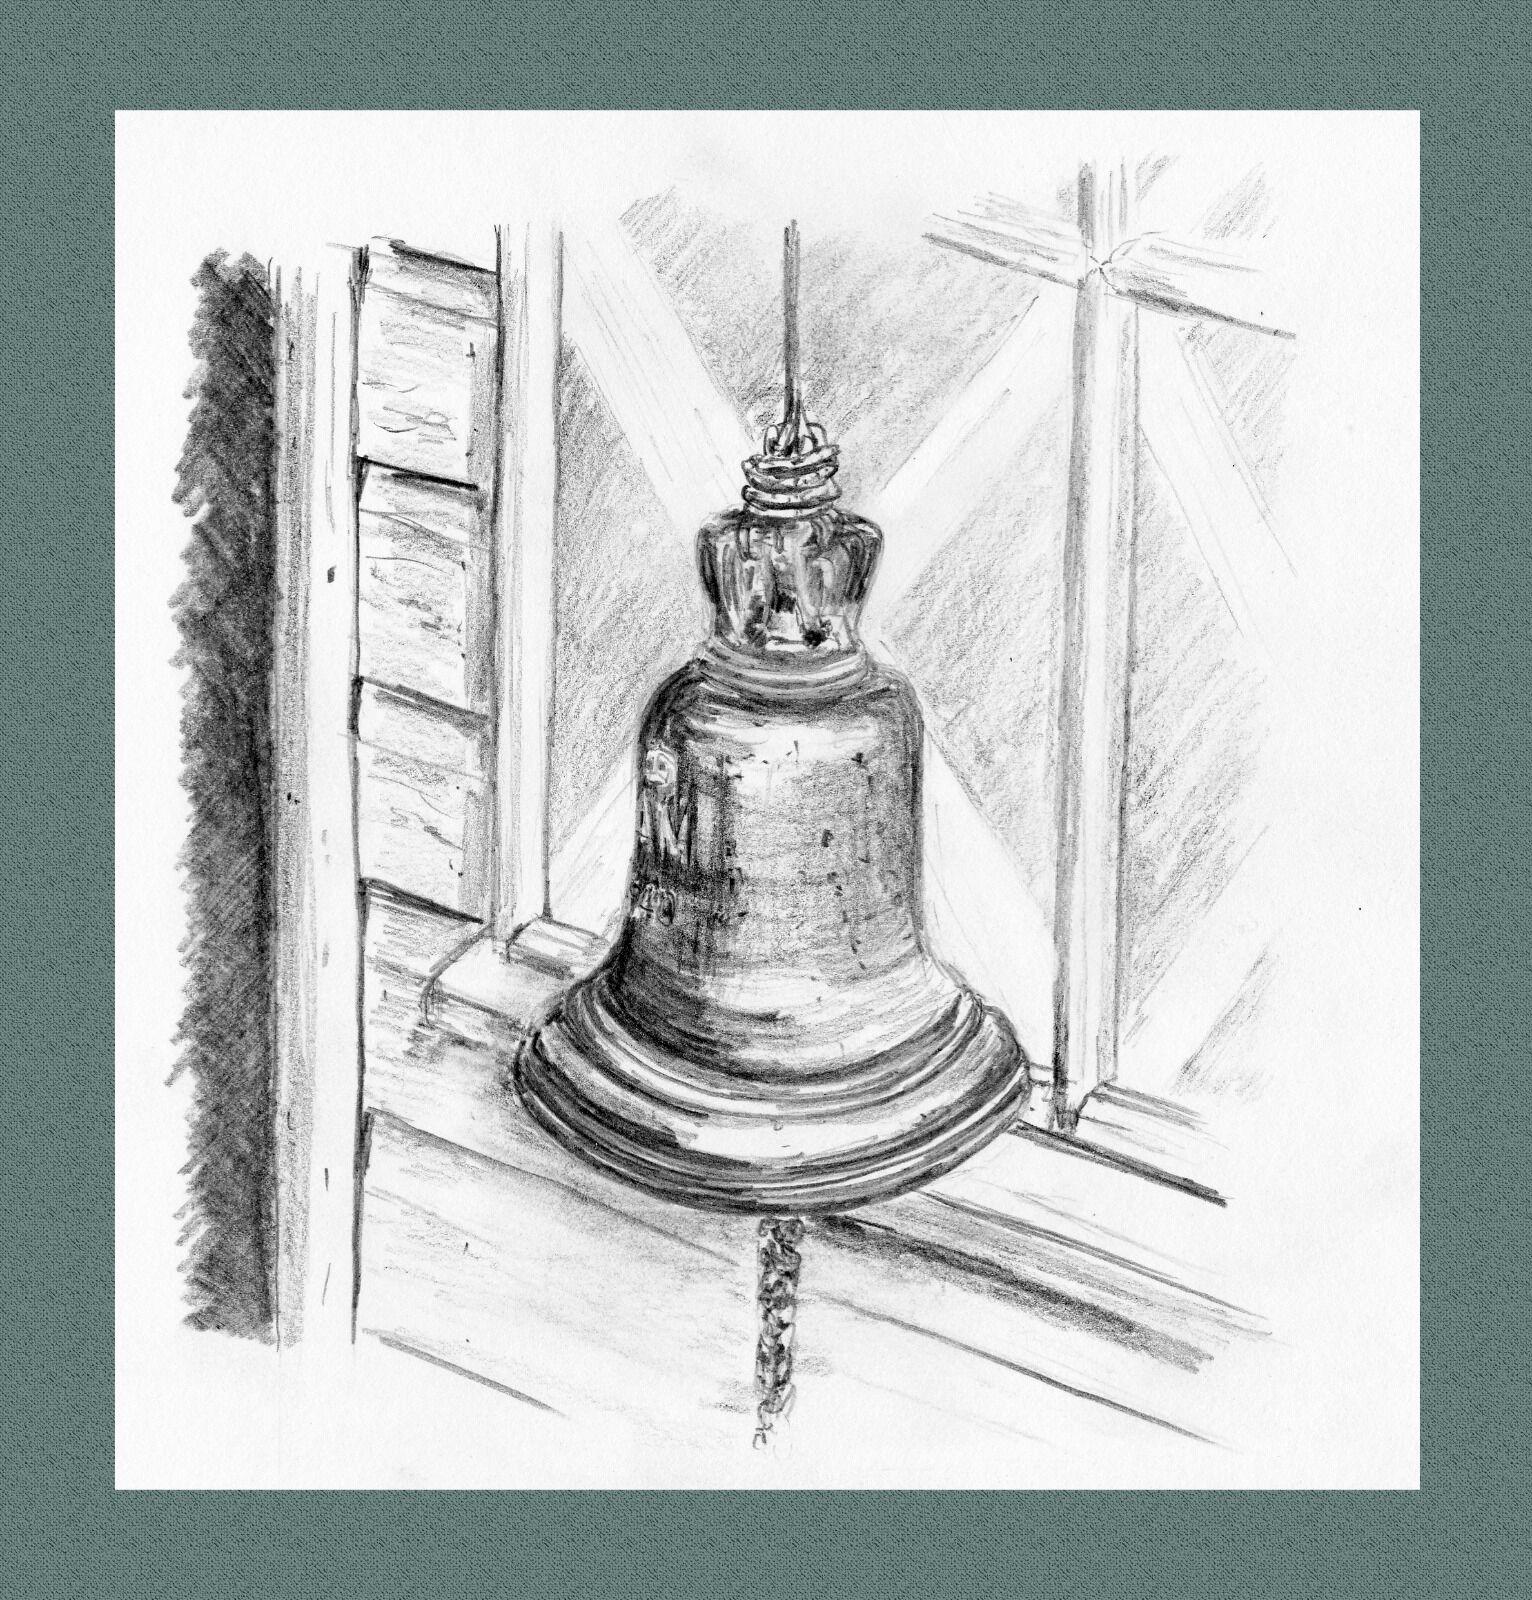 Scramble Bell outside dispersal hut.